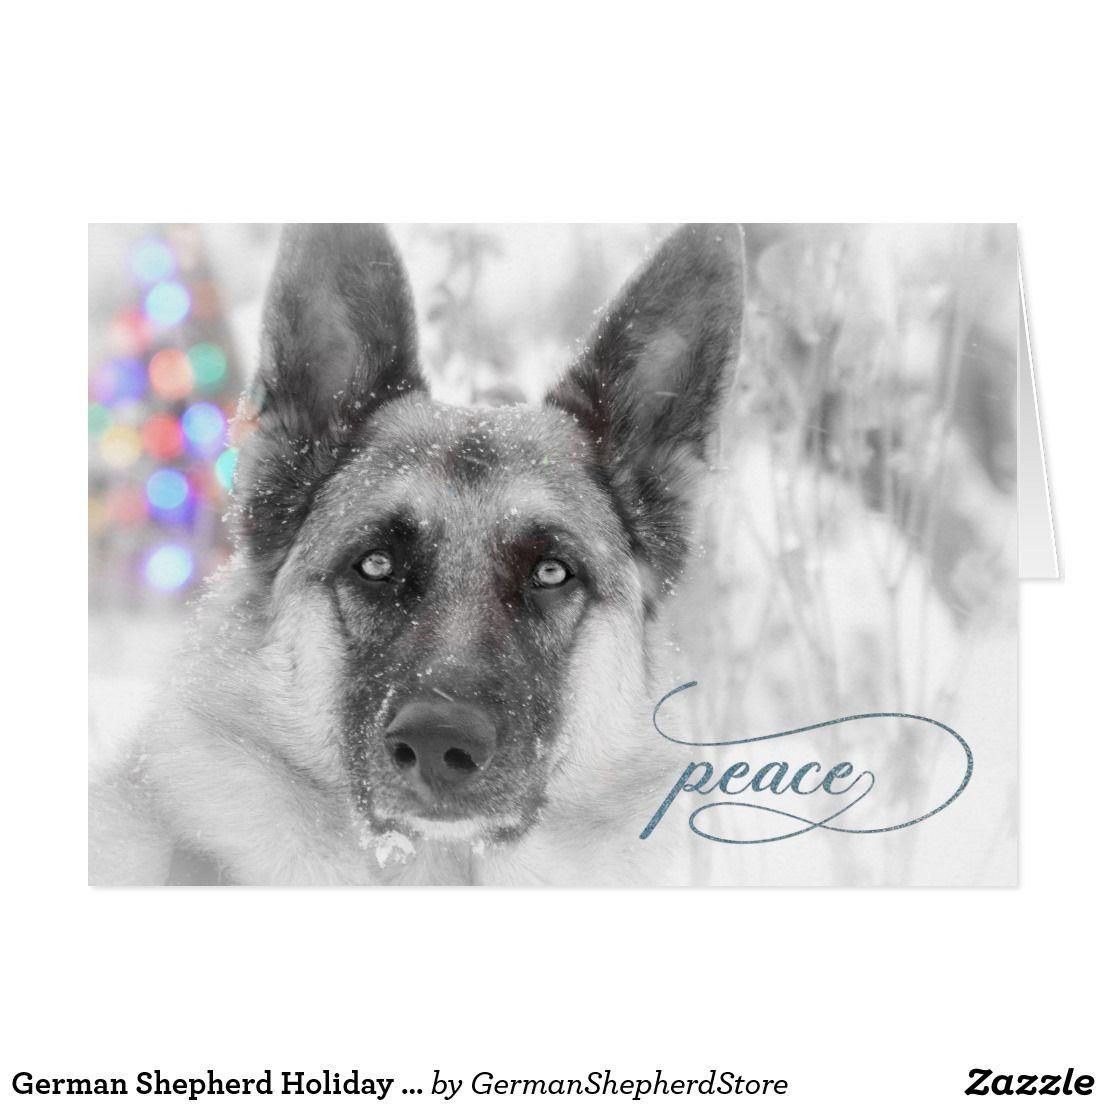 German Shepherd Holiday Greeting Card Shepherds Malinois